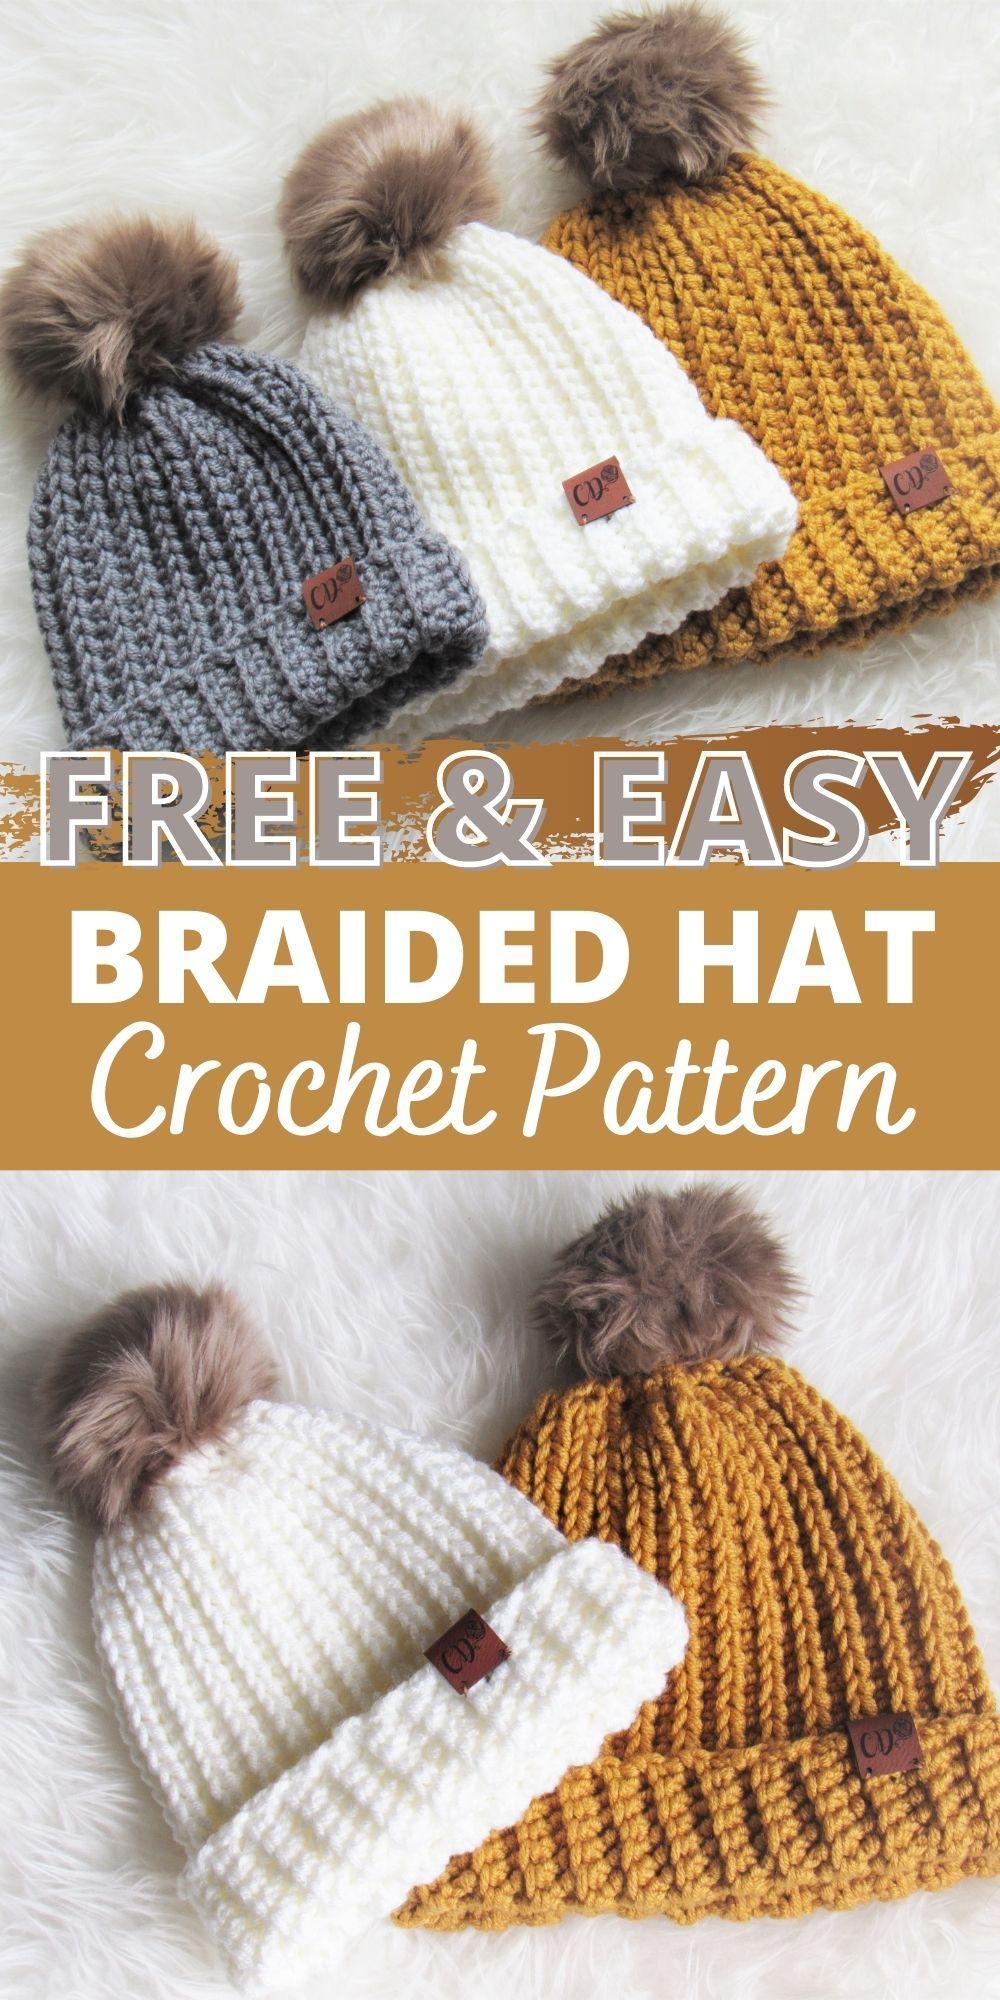 Crochet Ribbed Beanie In 6 Sizes Crochet Dreamz Crochet Beanie Pattern Free Crochet Hats Free Pattern Crochet Hat Pattern